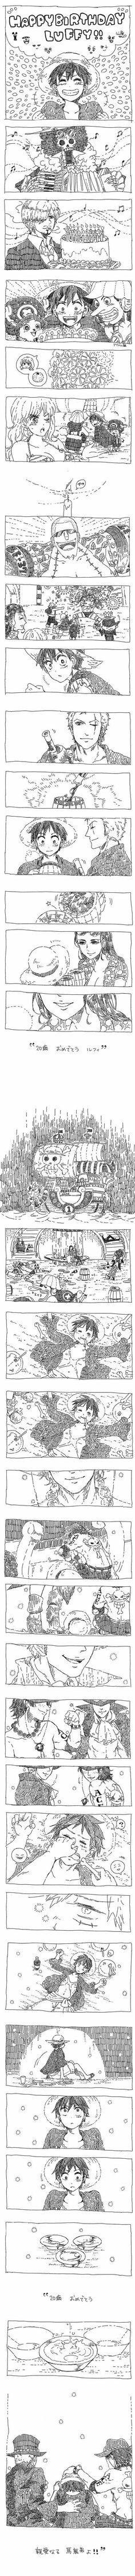 Happy Birthday Luffy, text, comic, smiling, sad, Thousand Sunny, Ace, Sabo, brothers, Luffy, ASL, Straw Hat Crew, Mugiwara, Luffy, Nami, Zoro, Usopp, Sanji, Chopper, Robin, Franky, Brook; One Piece